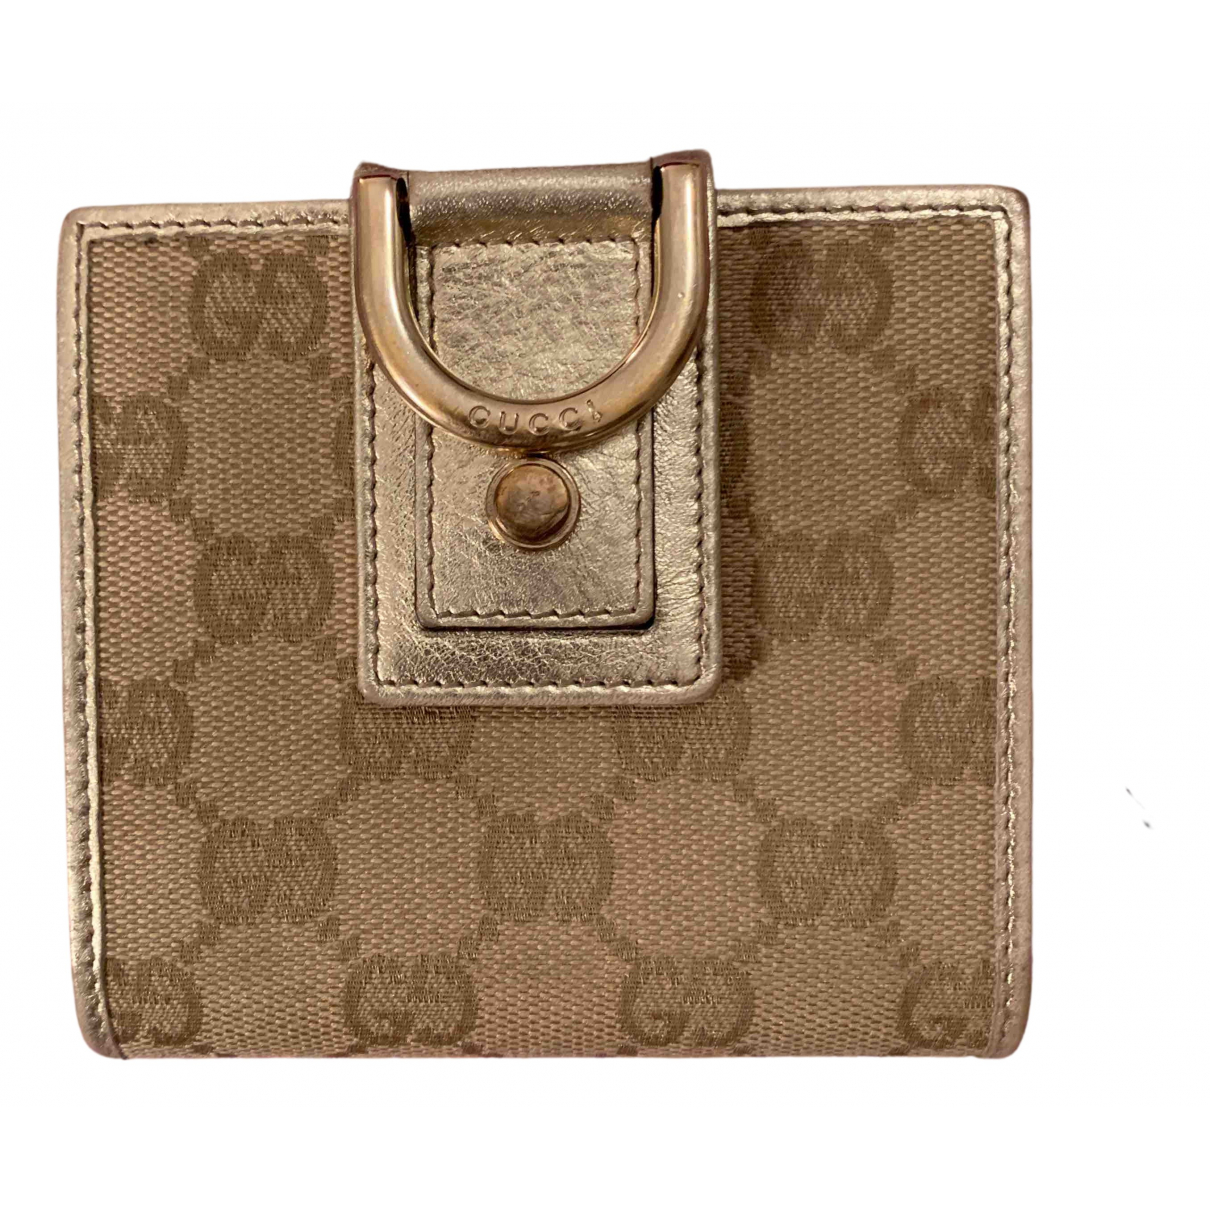 Gucci N Beige Cloth wallet for Women N